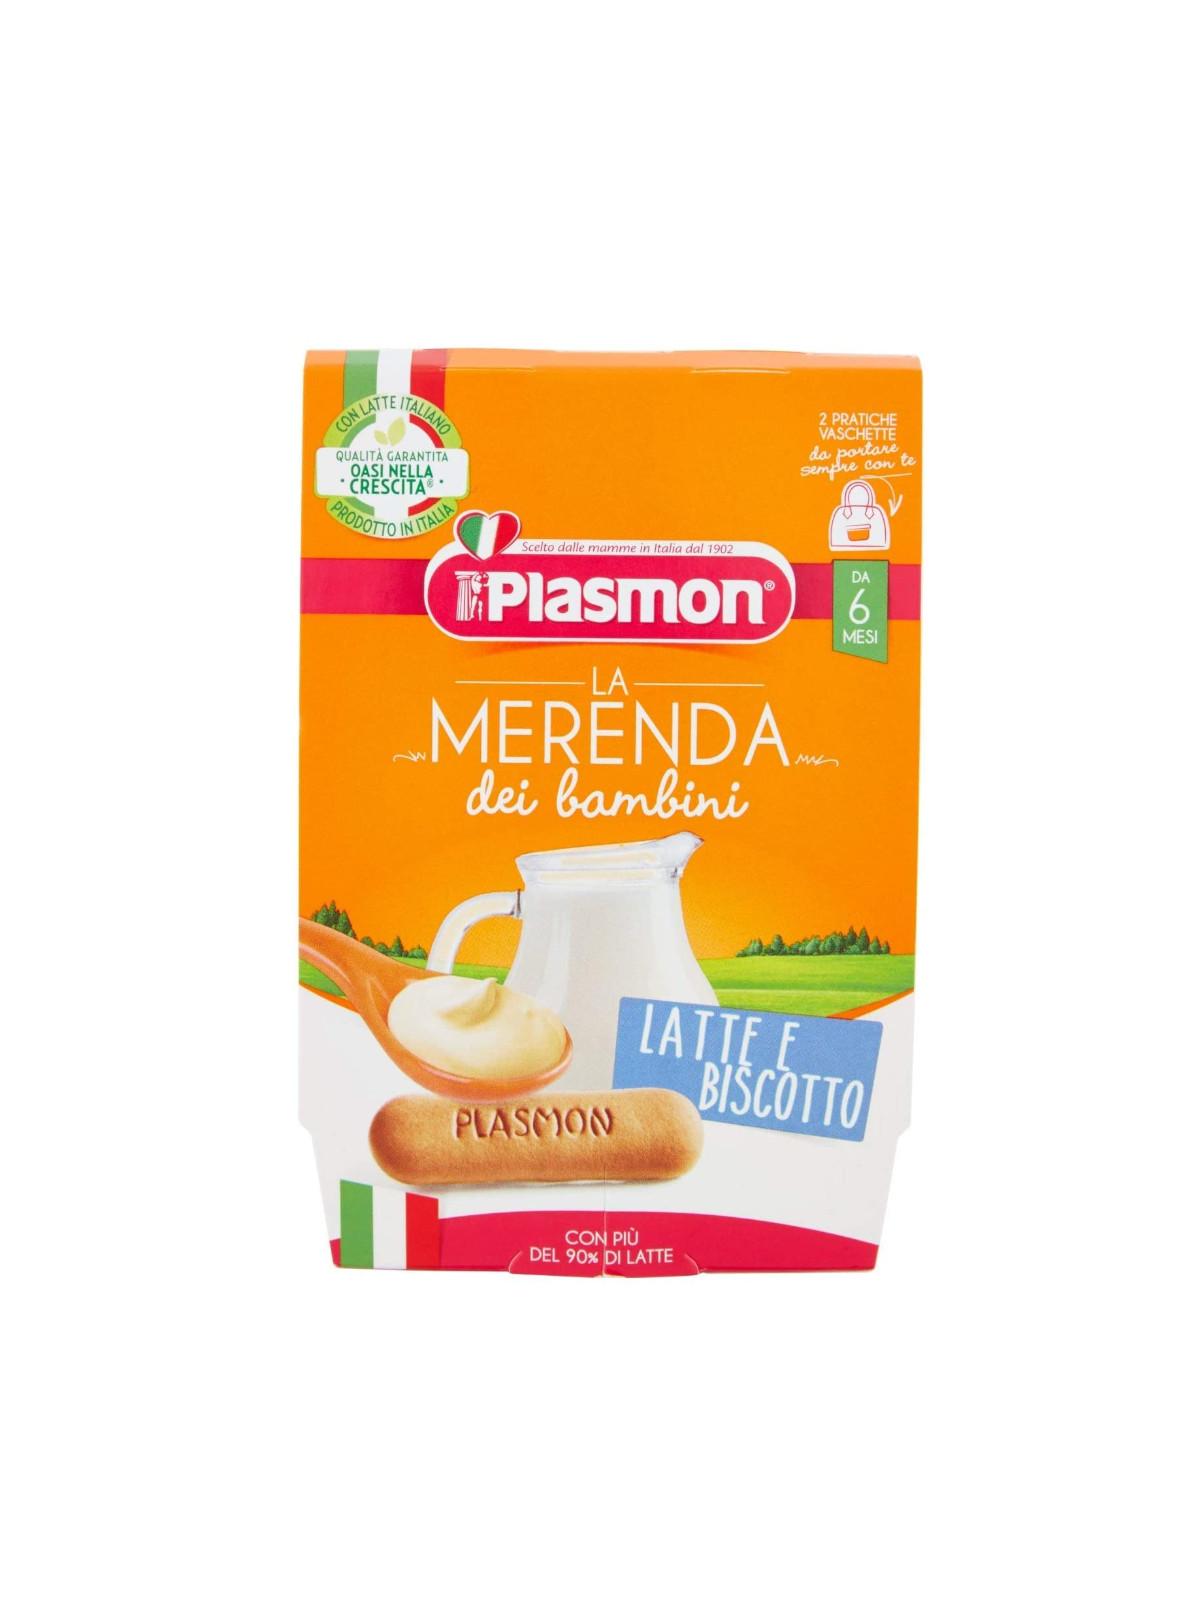 Plasmon - merenda latte biscotto - 2x120g - Plasmon